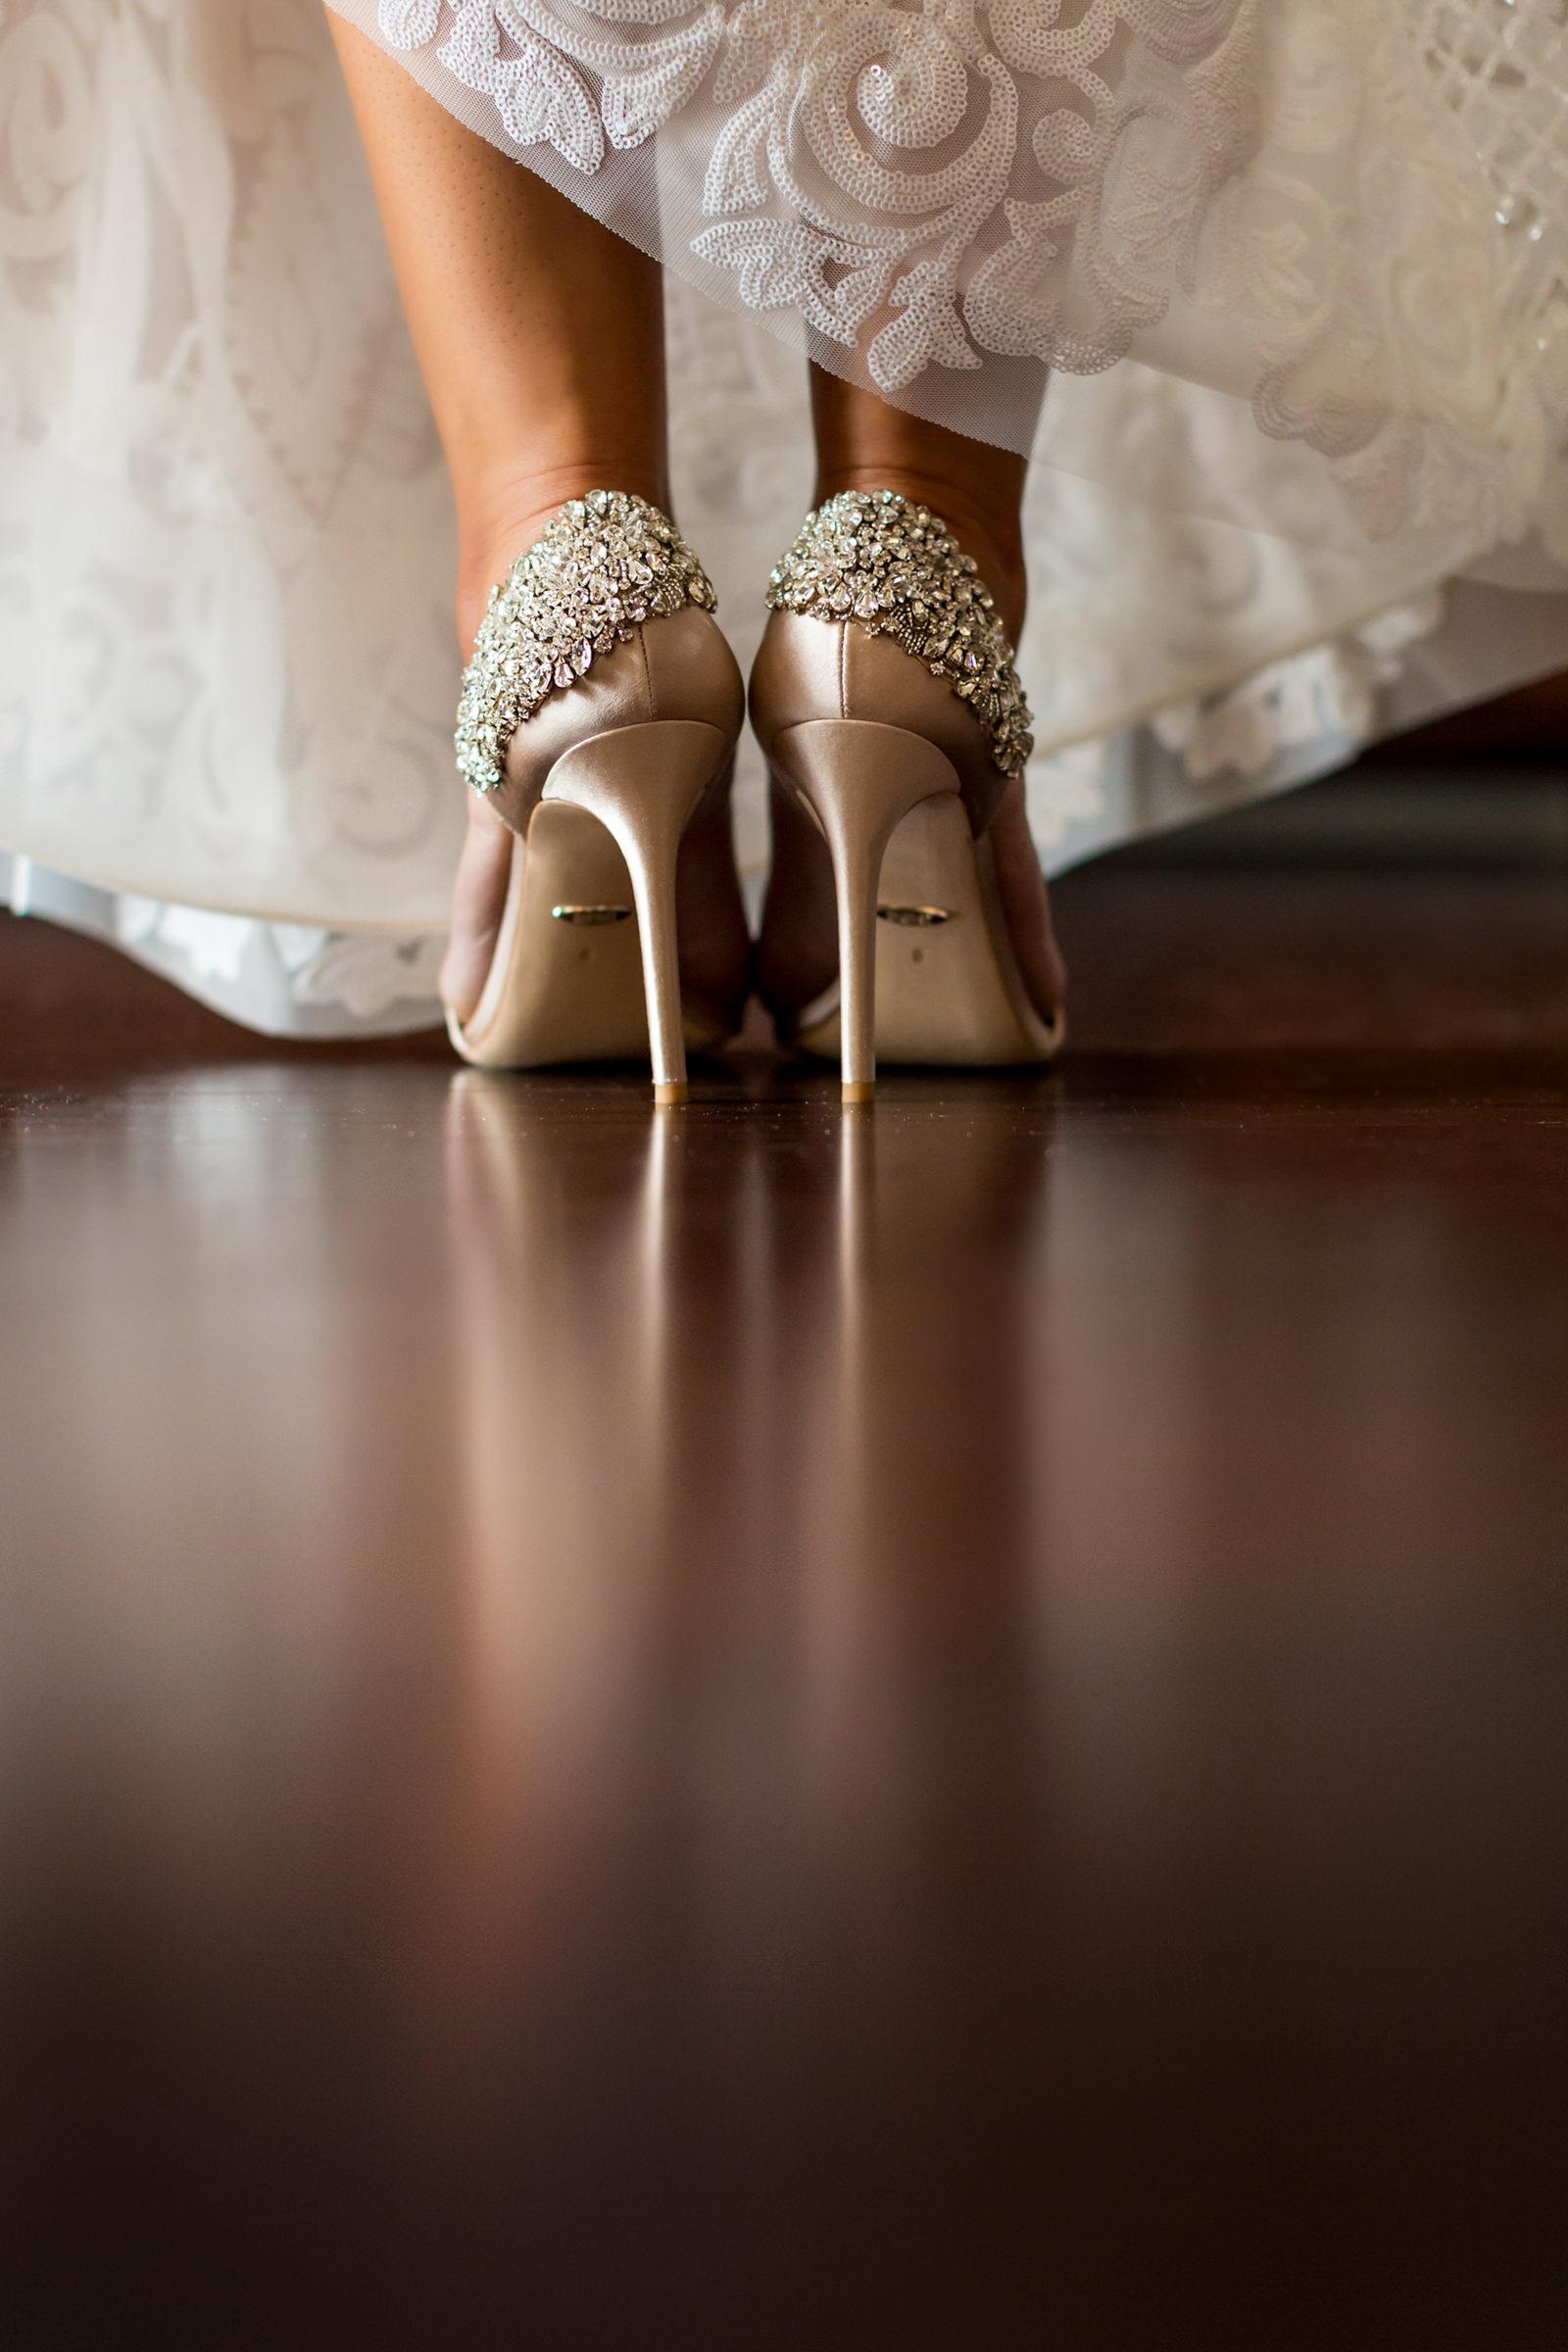 Jimmy Choo bead encrusted pink heels - photo by Procopio Photography